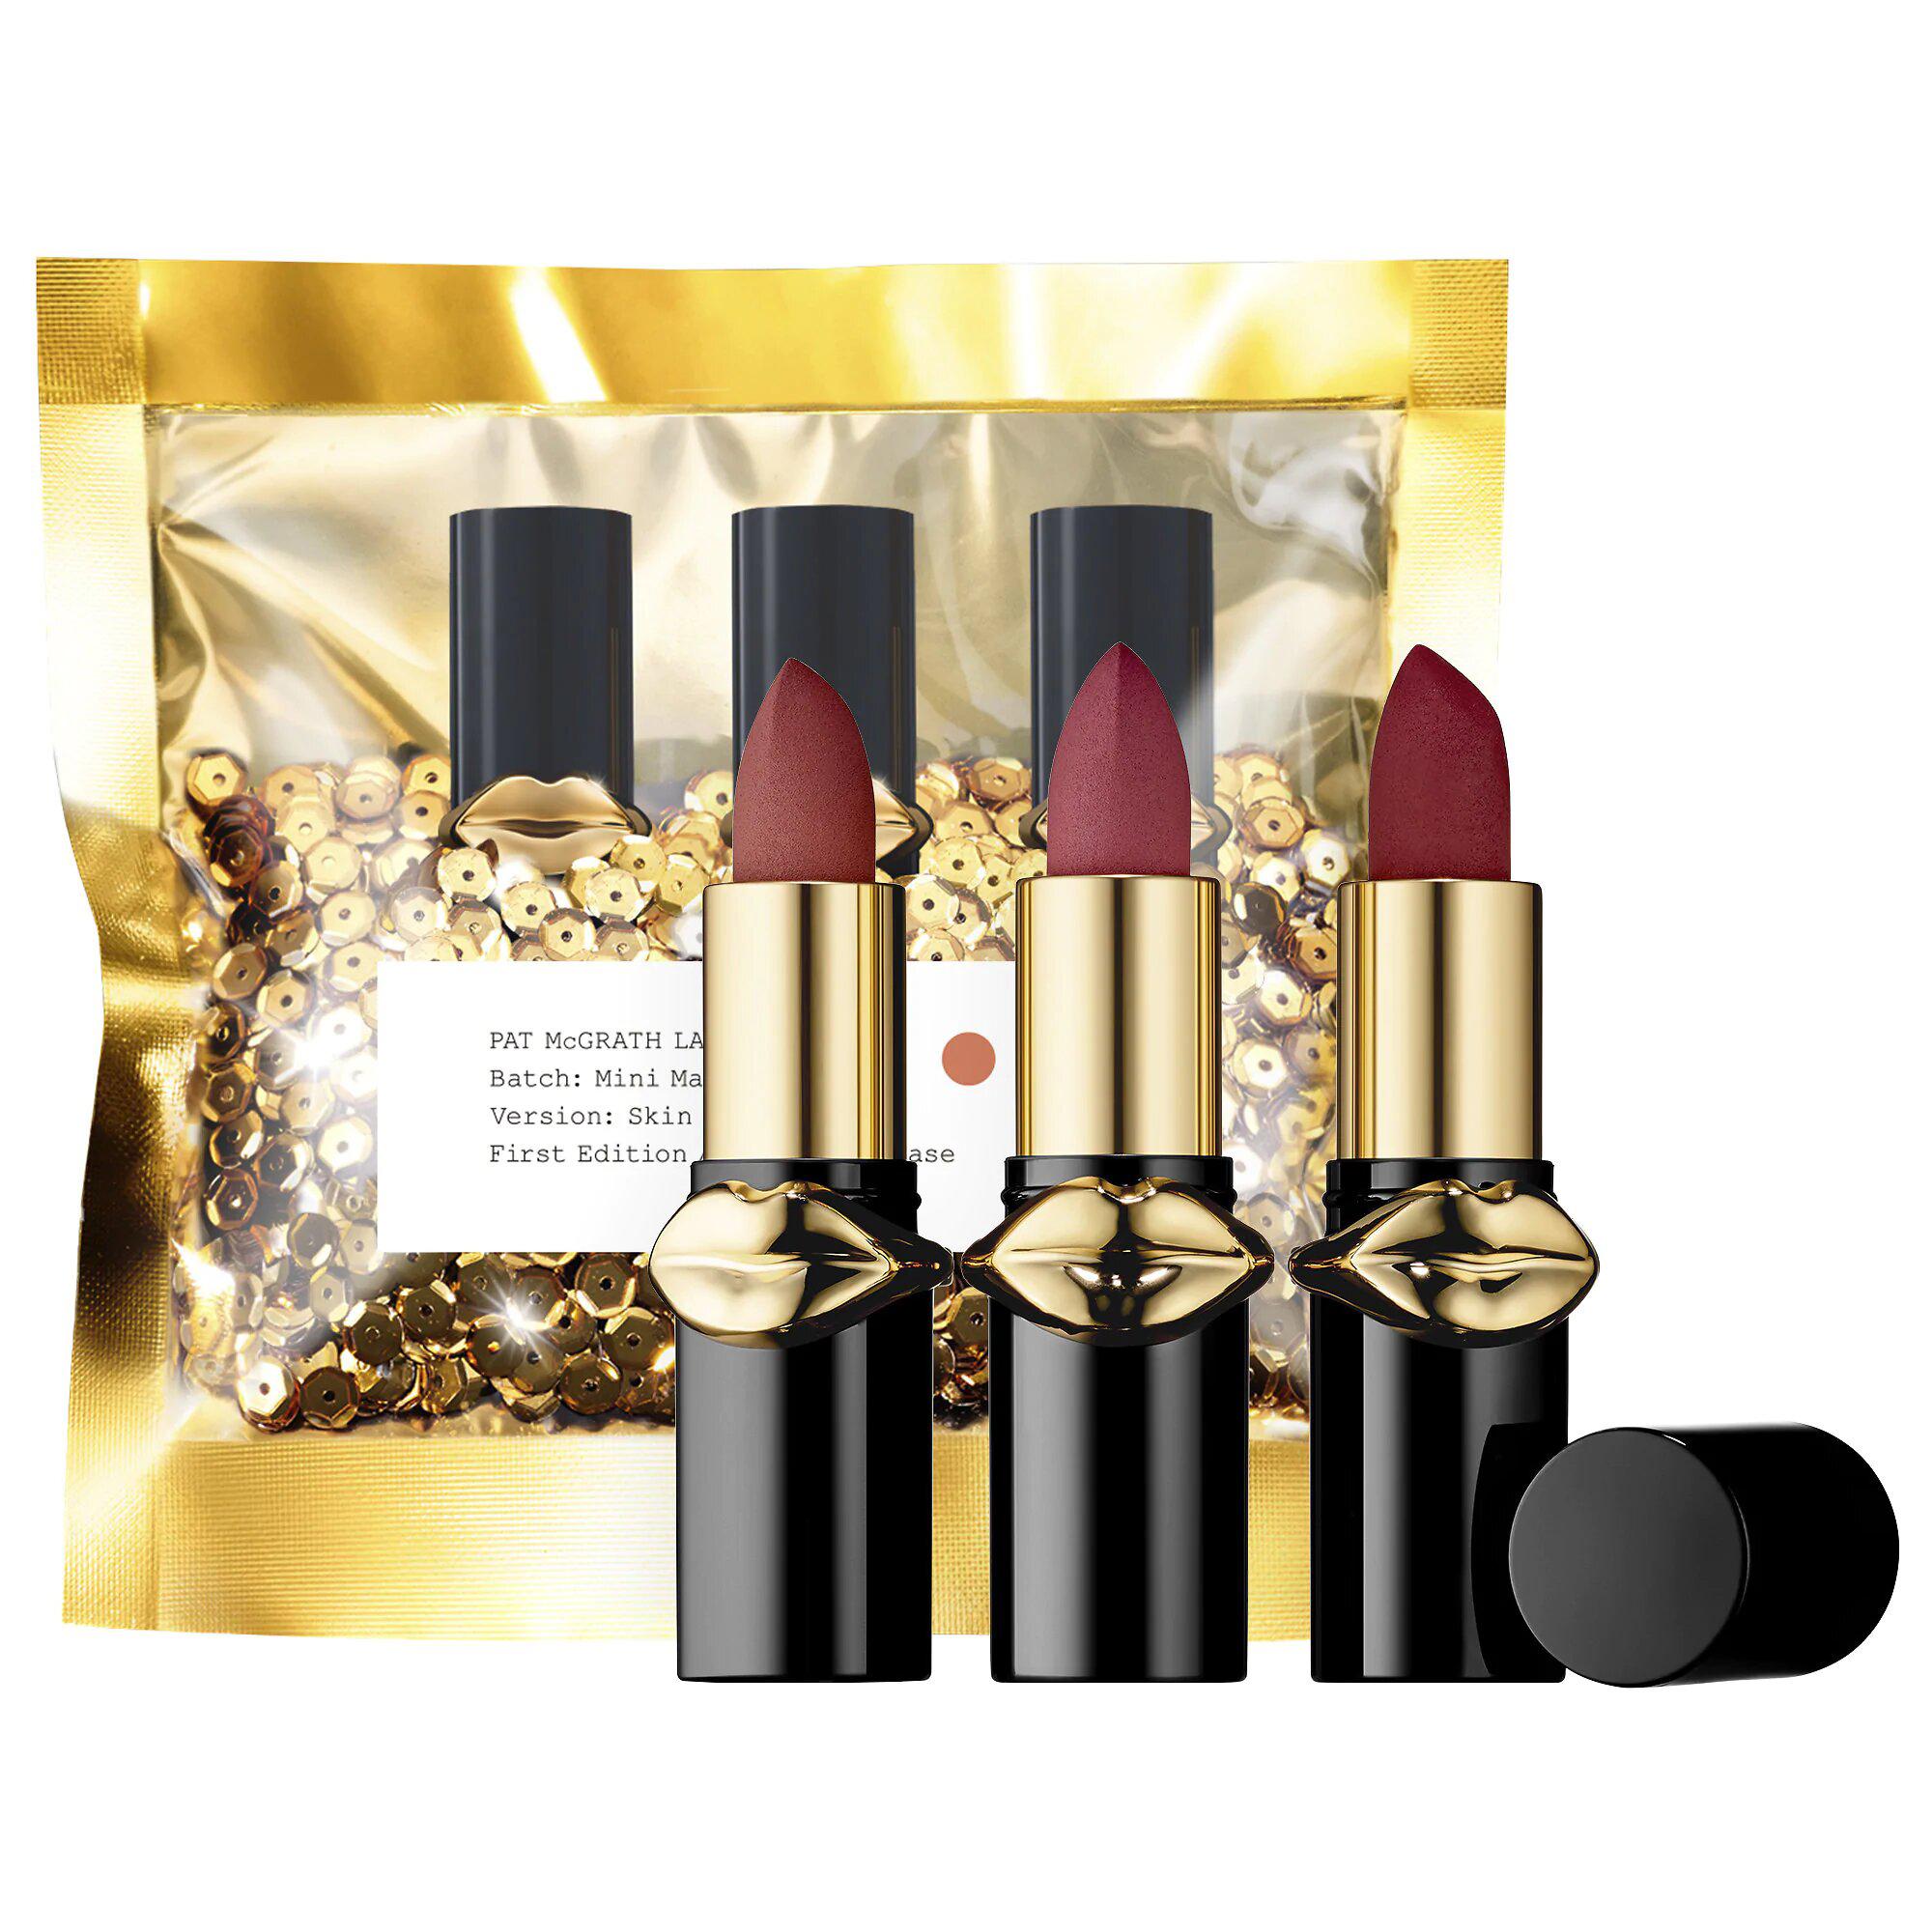 122619-lust-mini-mattetrance-lipstick-trio-pat-mcgrath-labs-embed.jpg